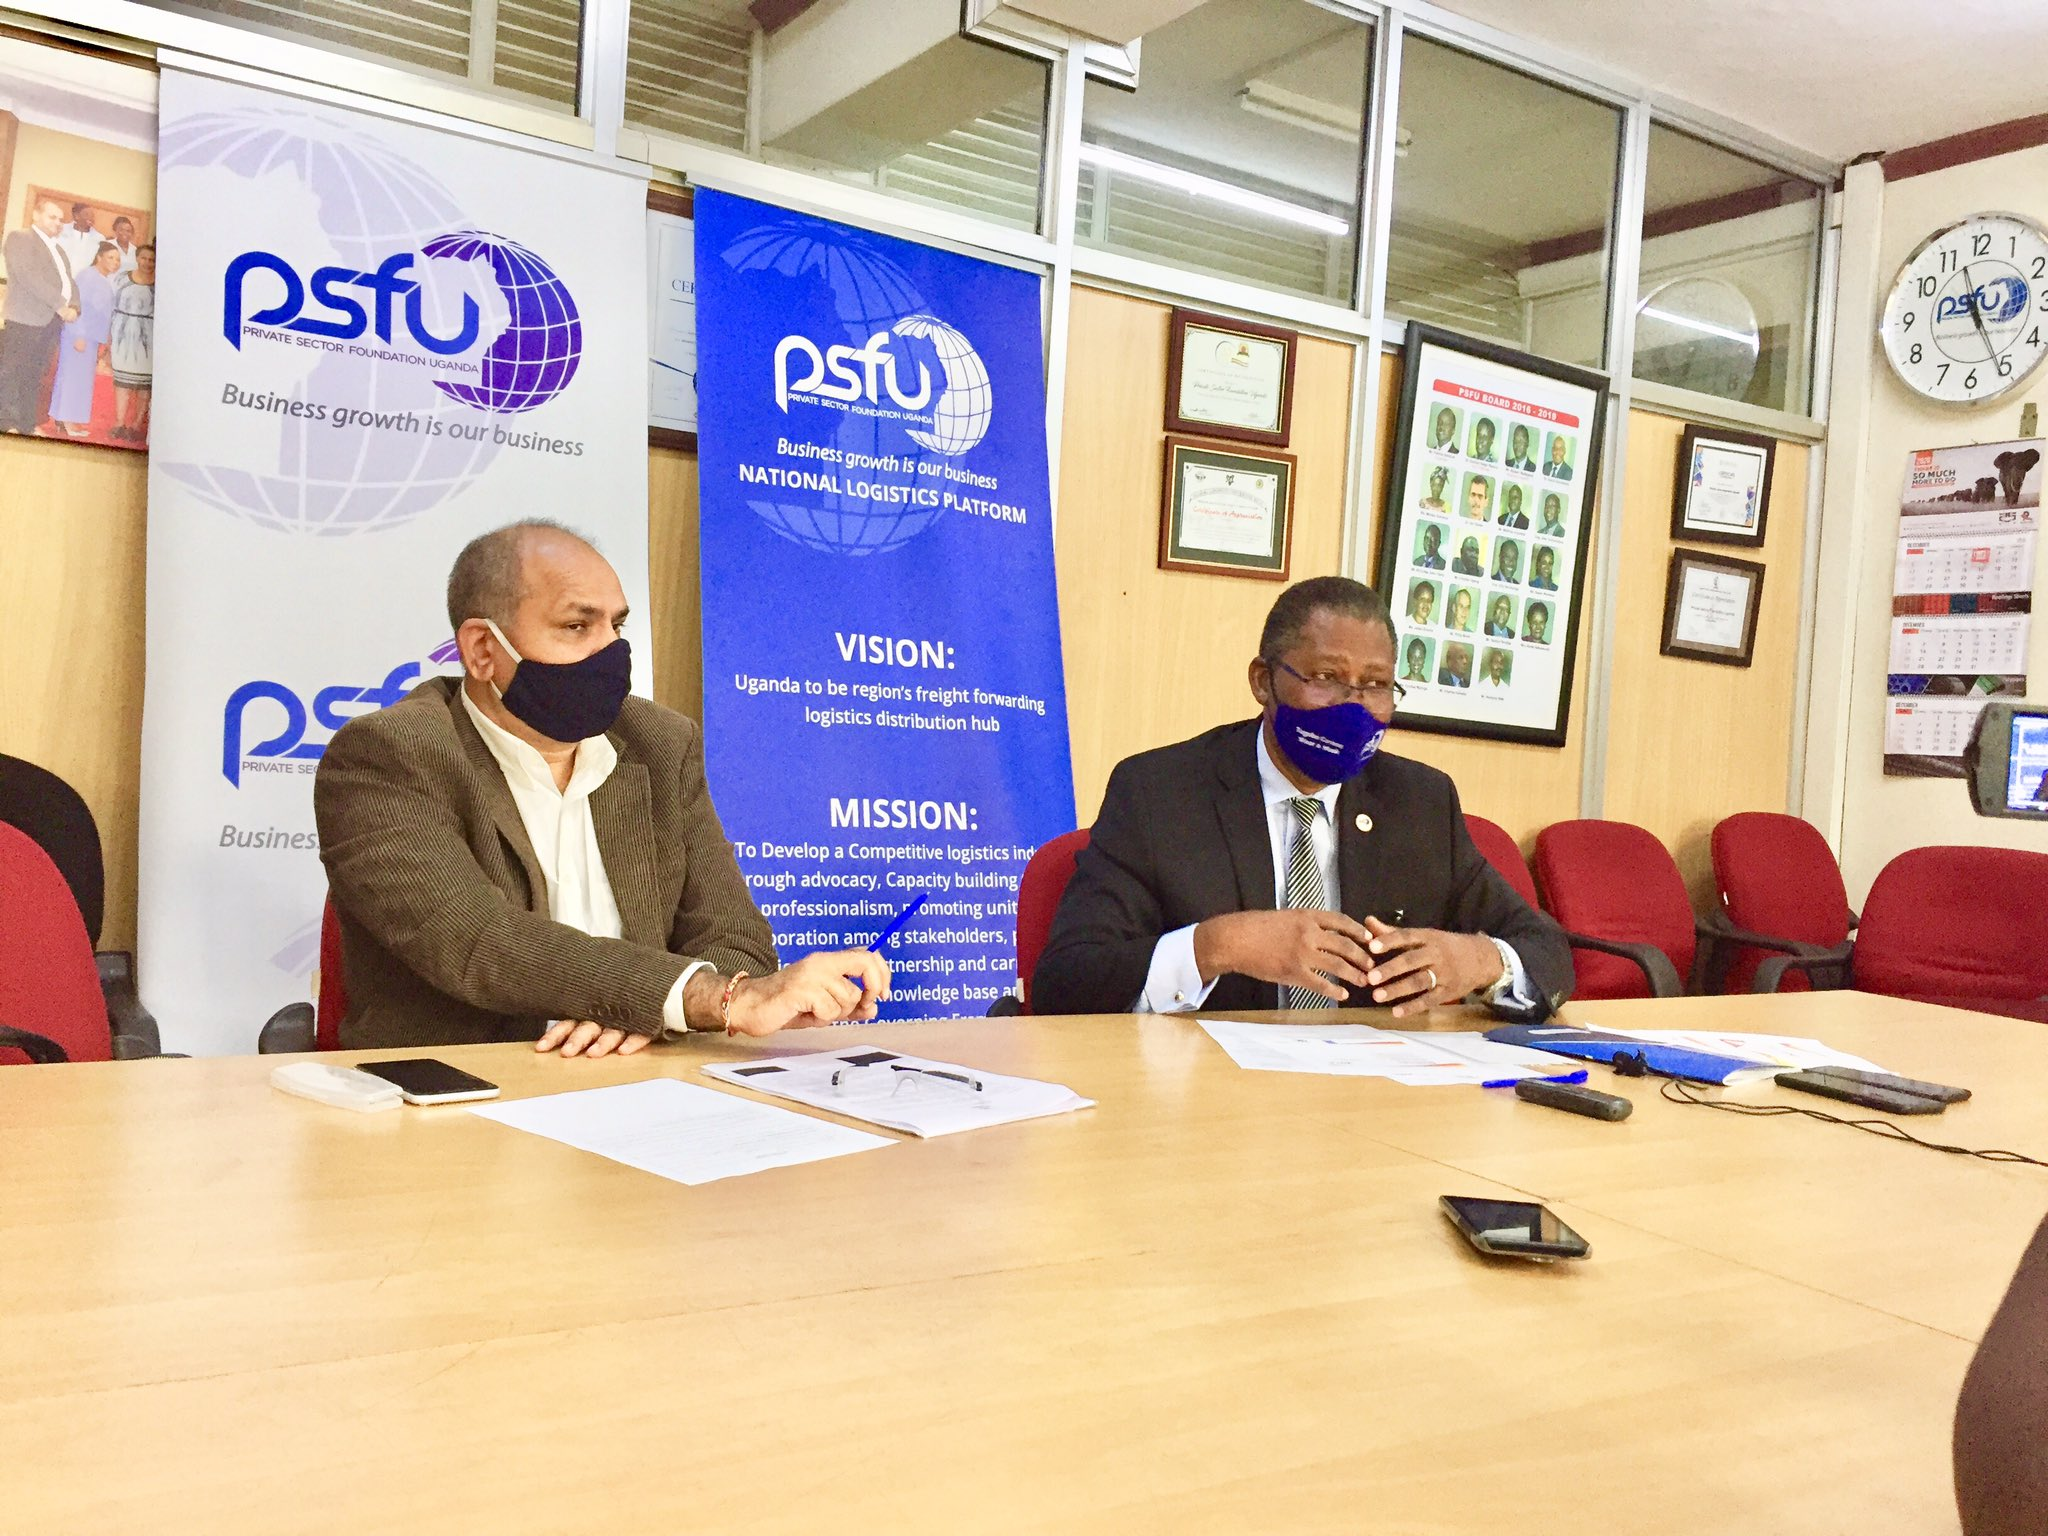 L-R: Mr Rajesh Chaplot, PSFU board member and Mr Gideon Badagawa, PSFU Executive Director addressing the media on Thursday